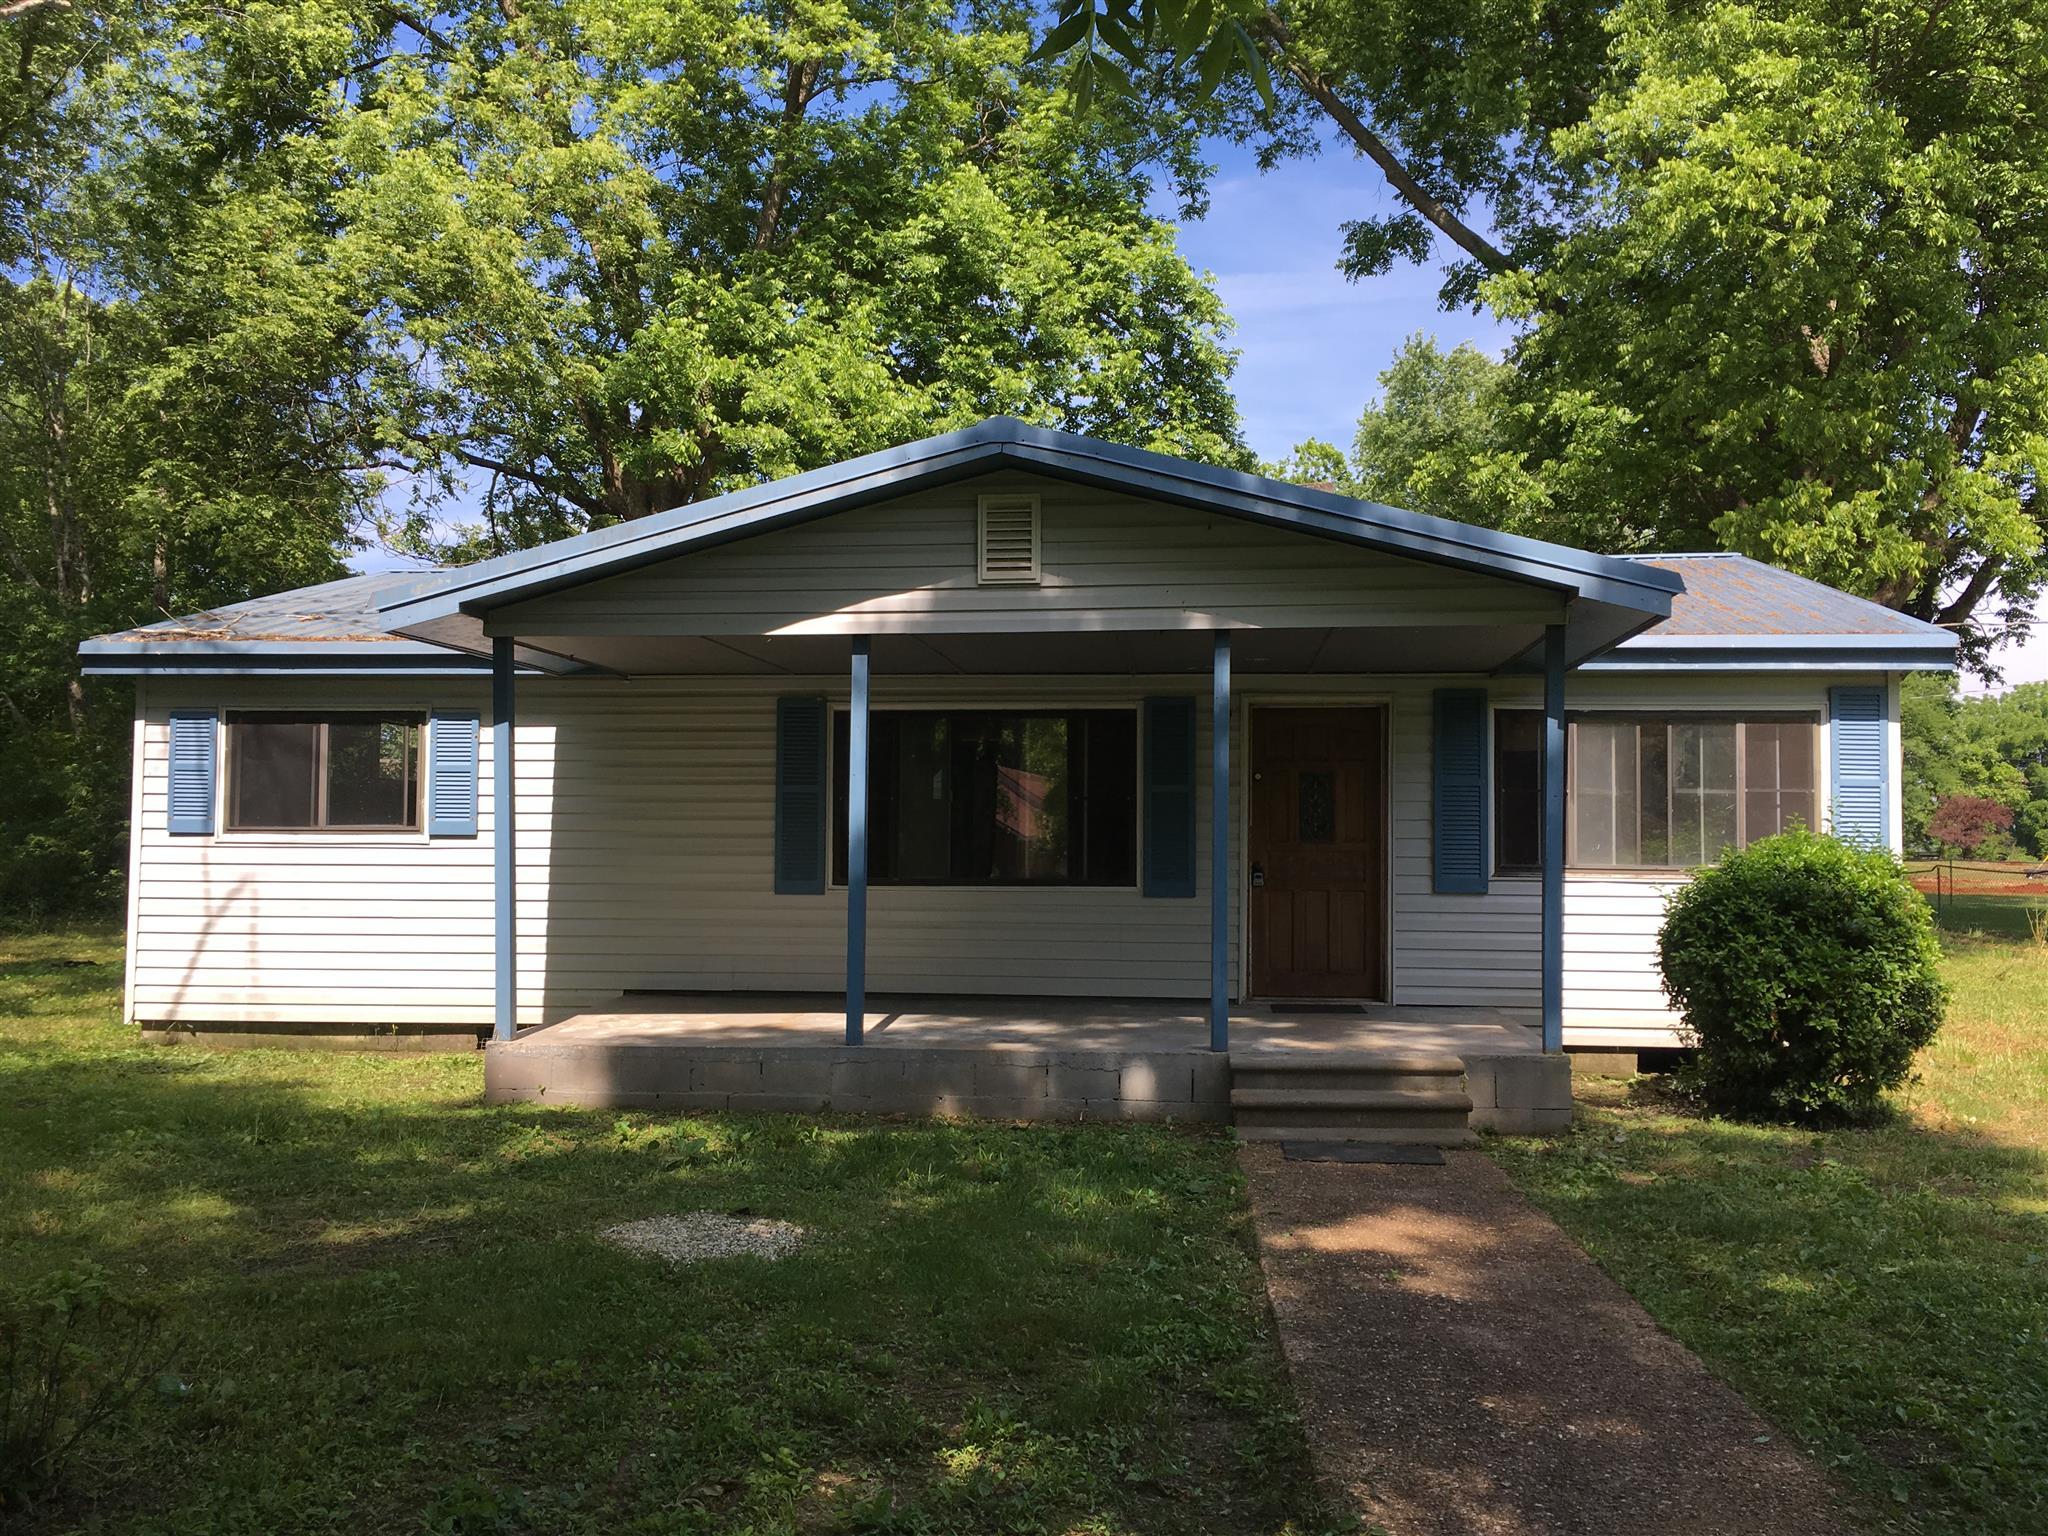 1125 Old Railroad Bed Rd, Taft, TN 38488 - Taft, TN real estate listing